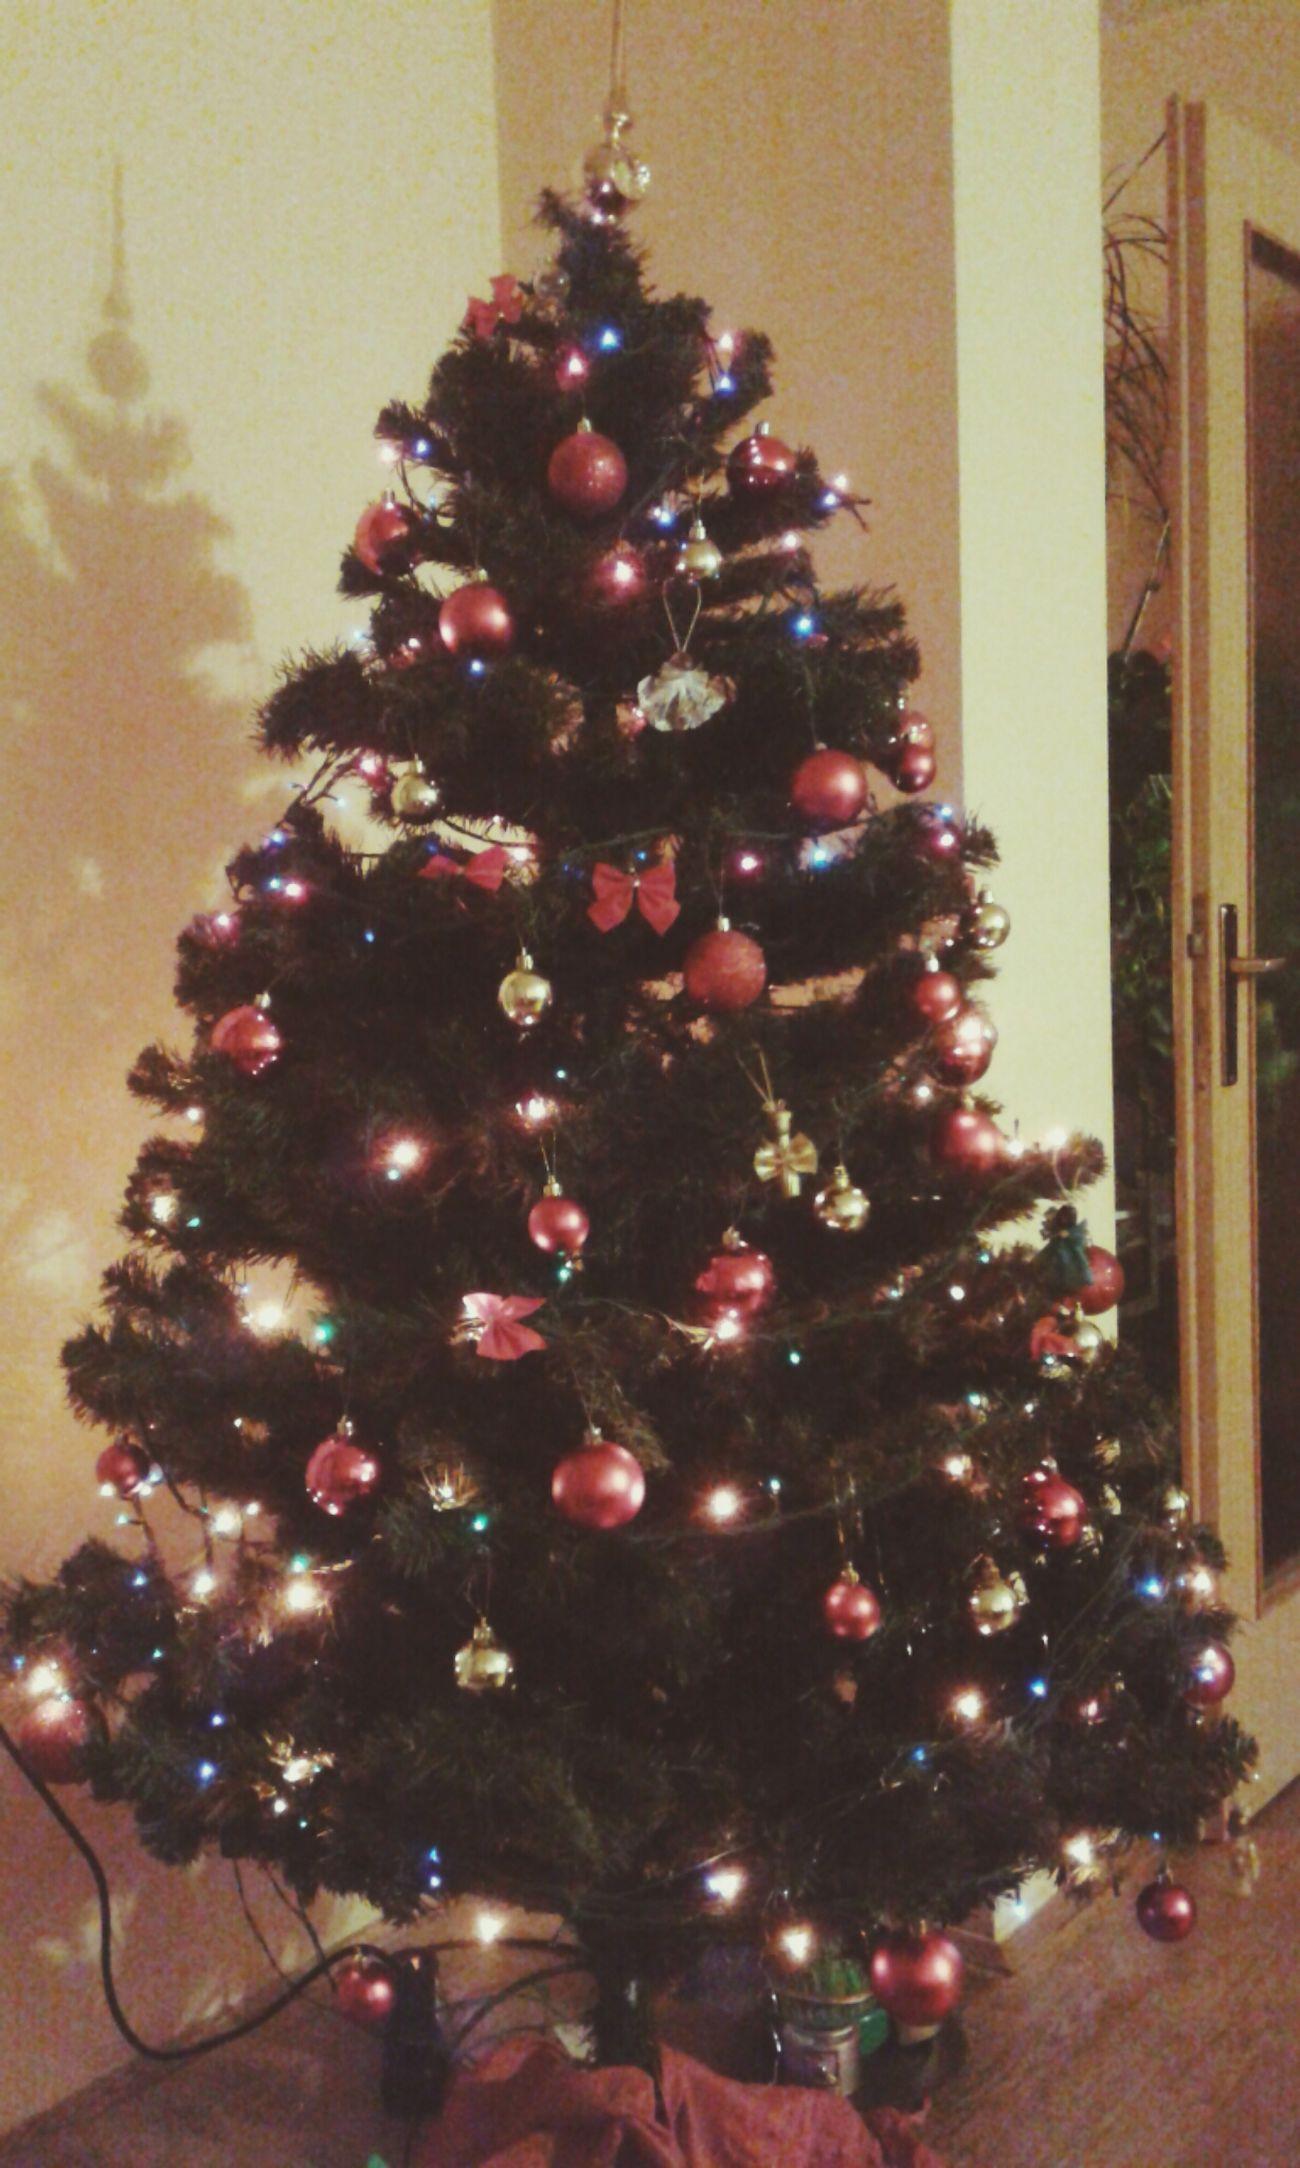 Merry Christmas!! ♥♥